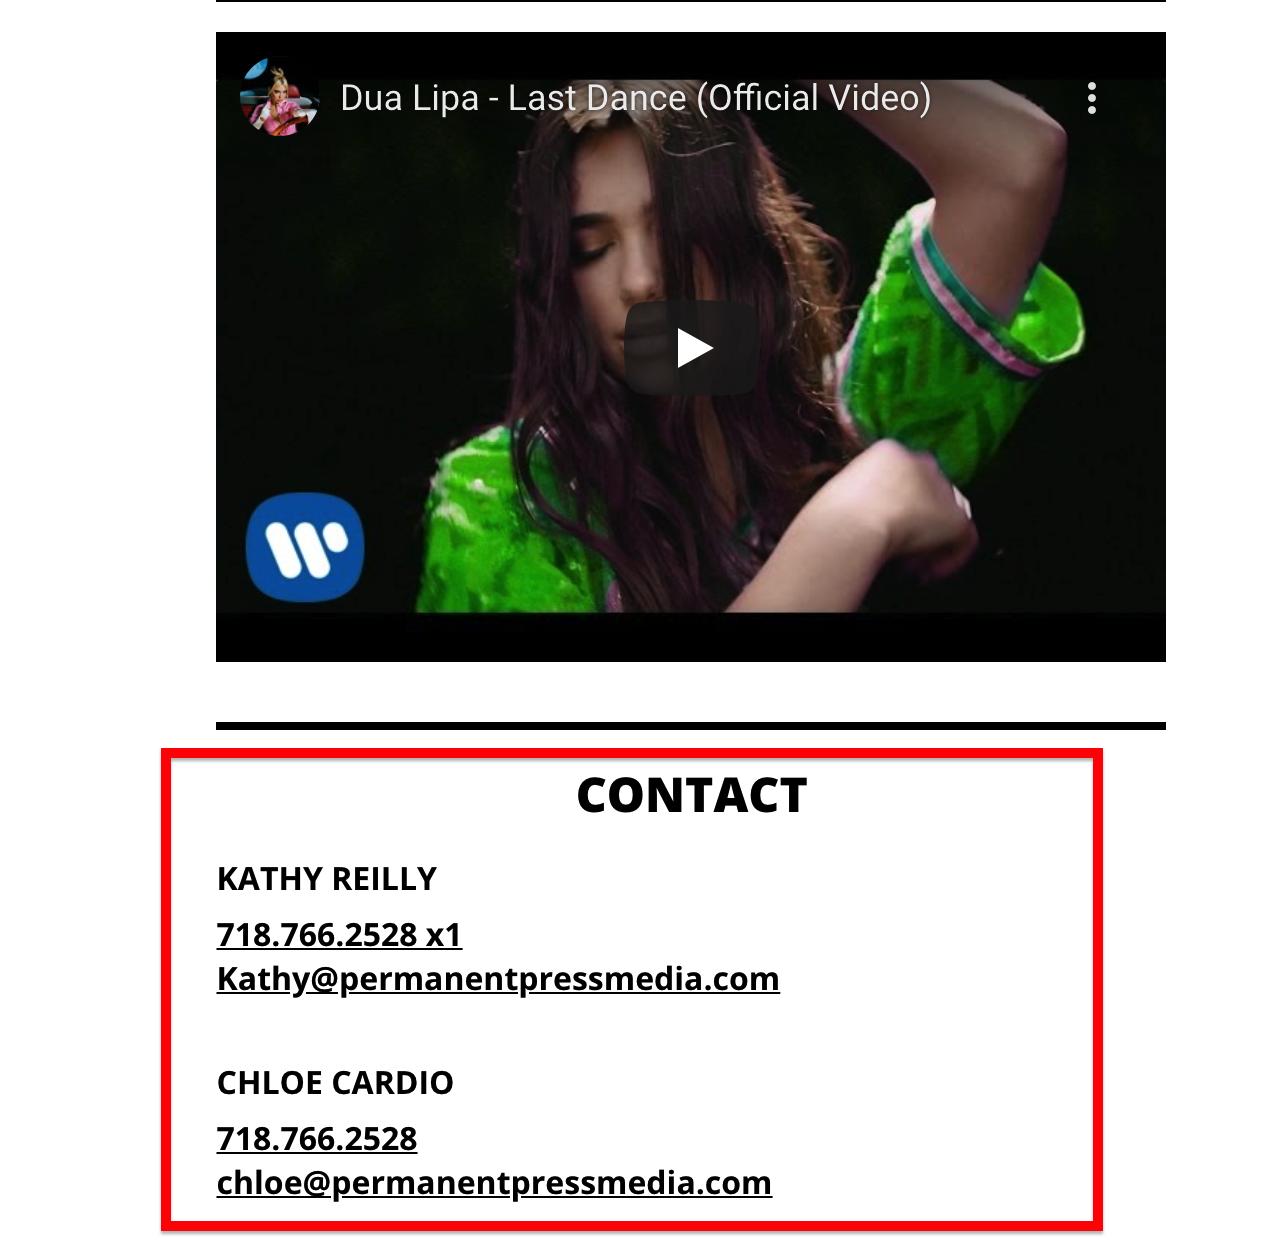 Artist contact information